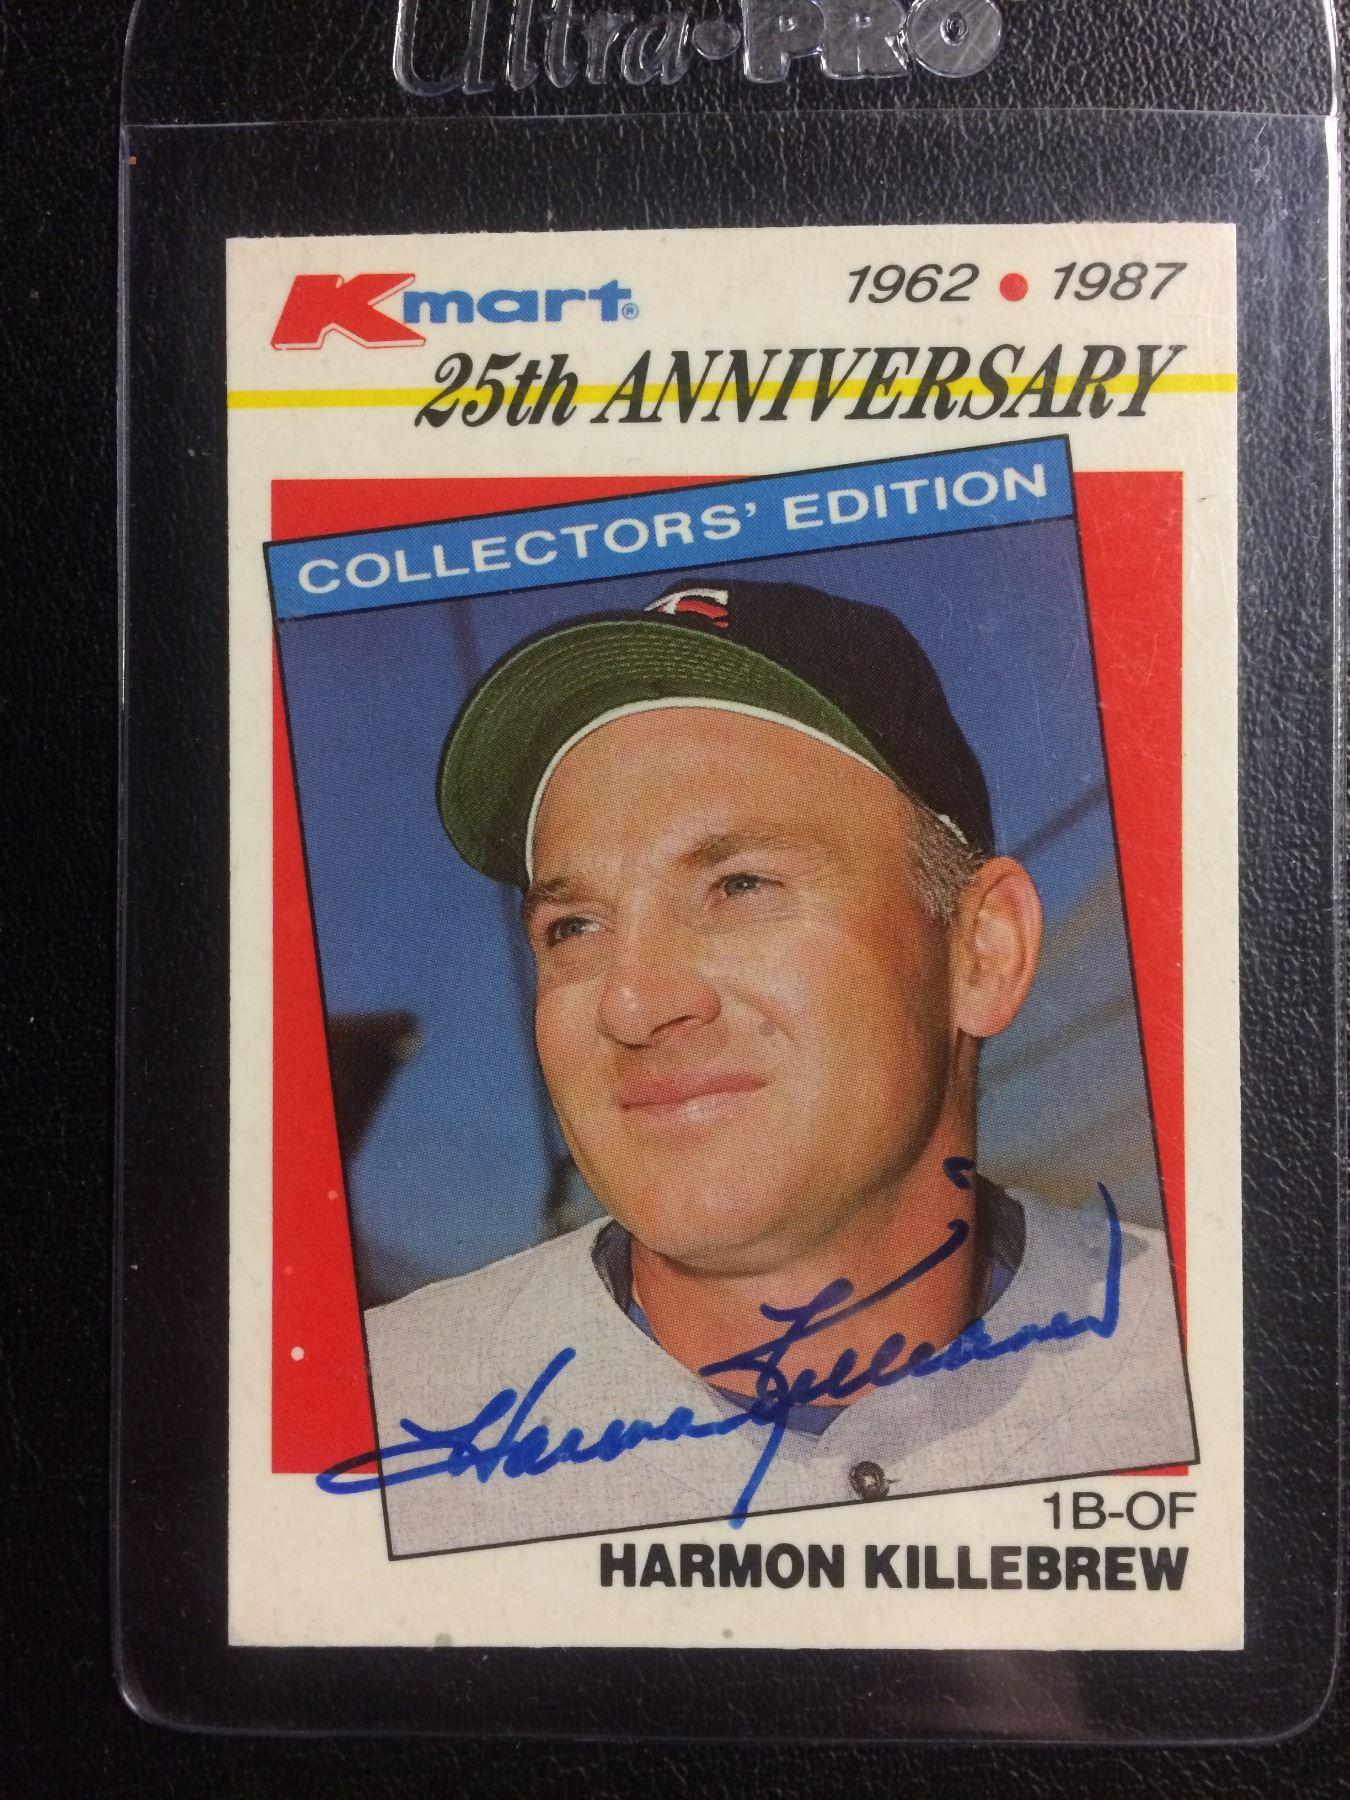 Autographed 1987 Topps Kmart Harmon Killebrew 25th Anniversary